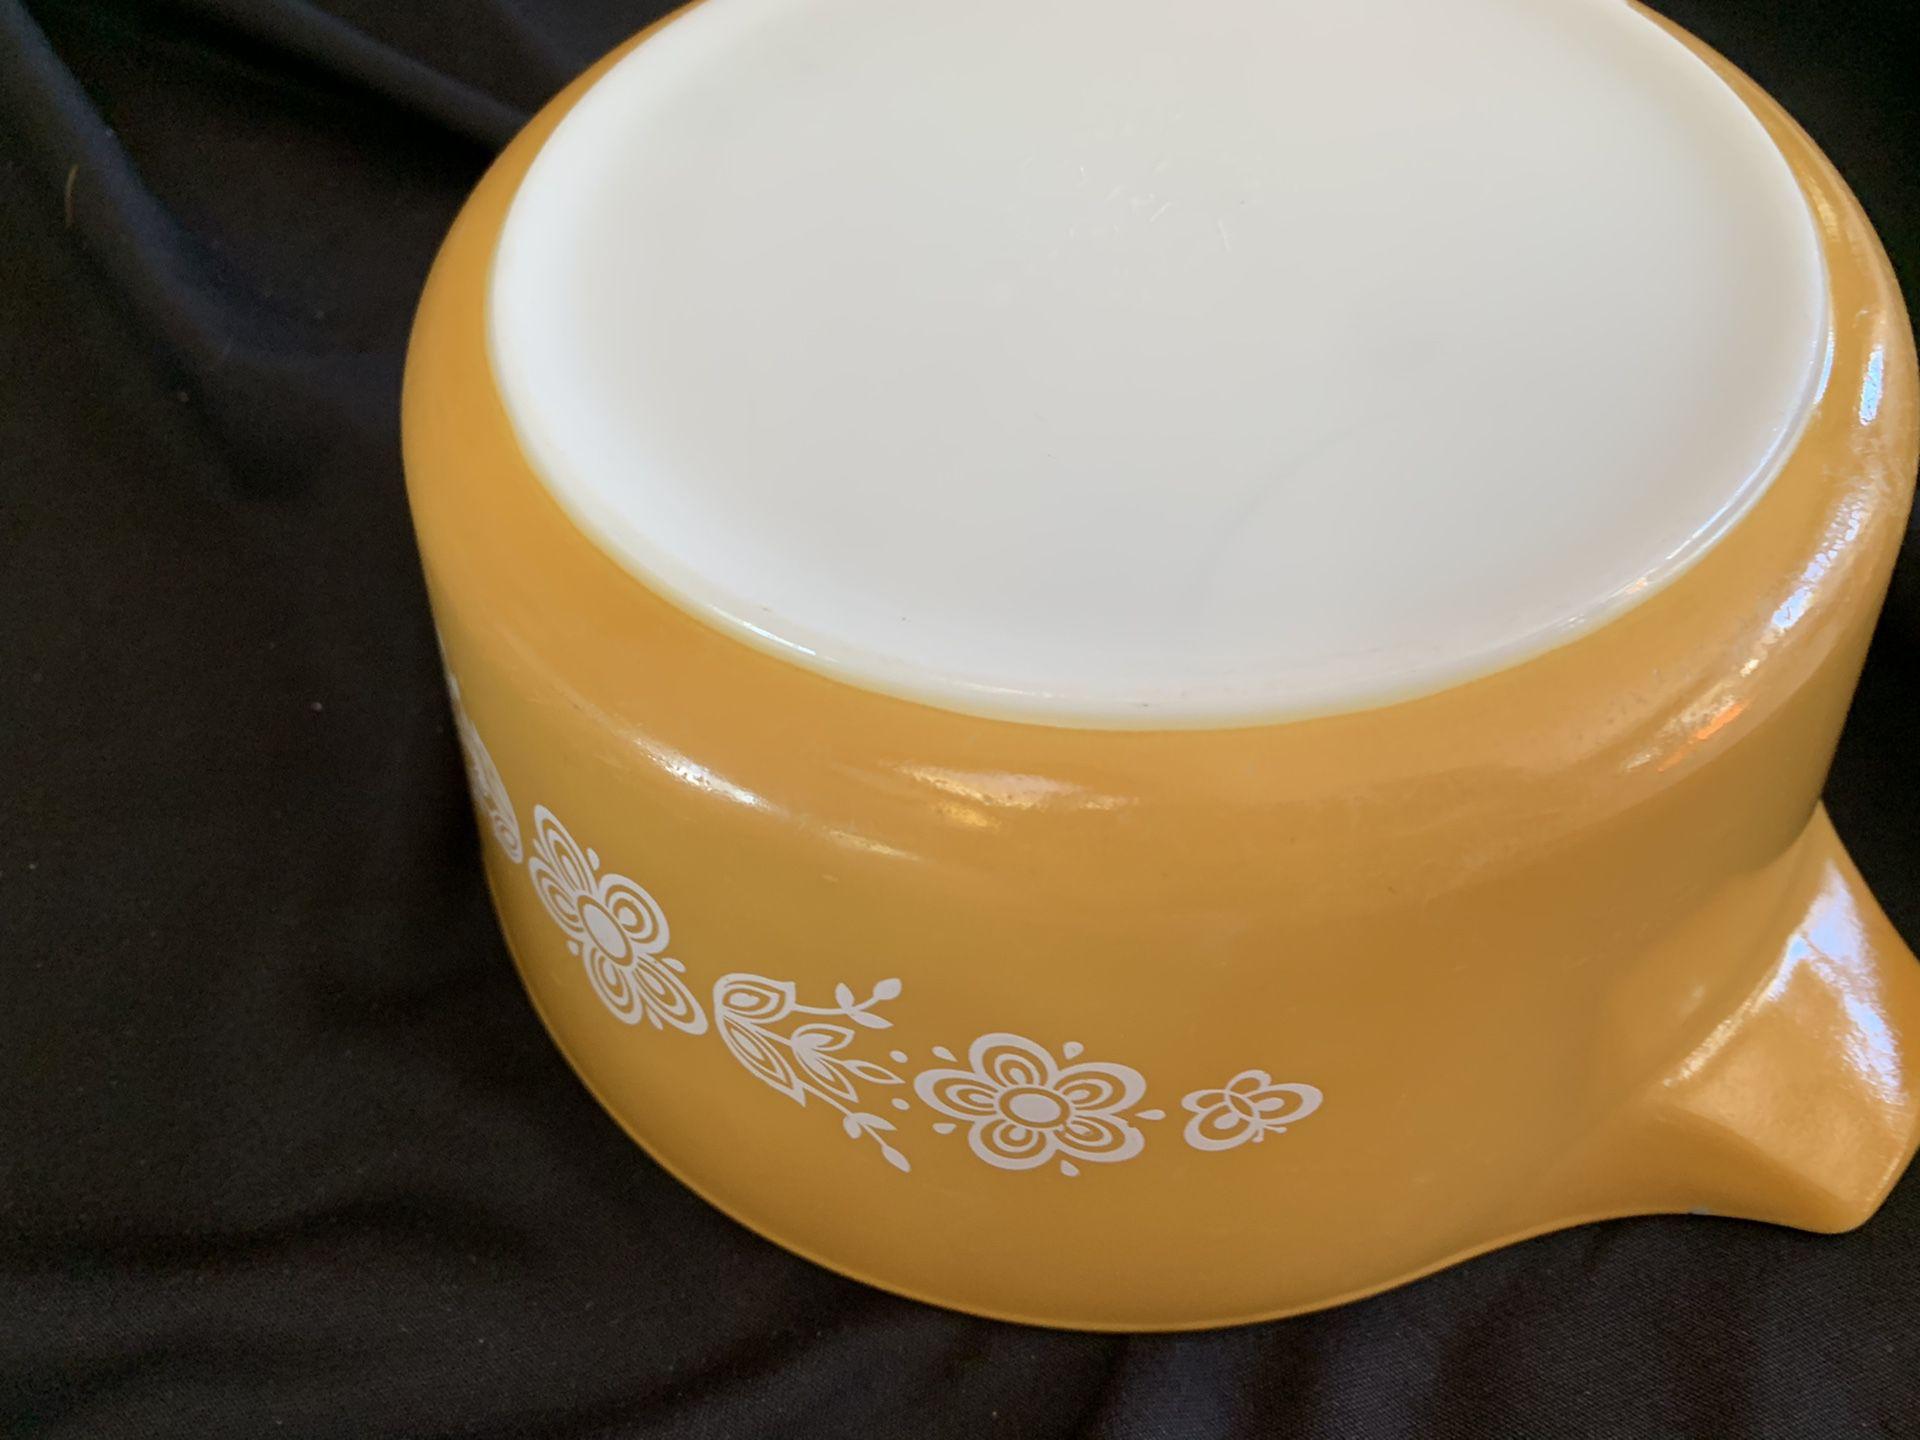 Pyrex 2 ½ qrt Cinderella bowl. Yellow/orange